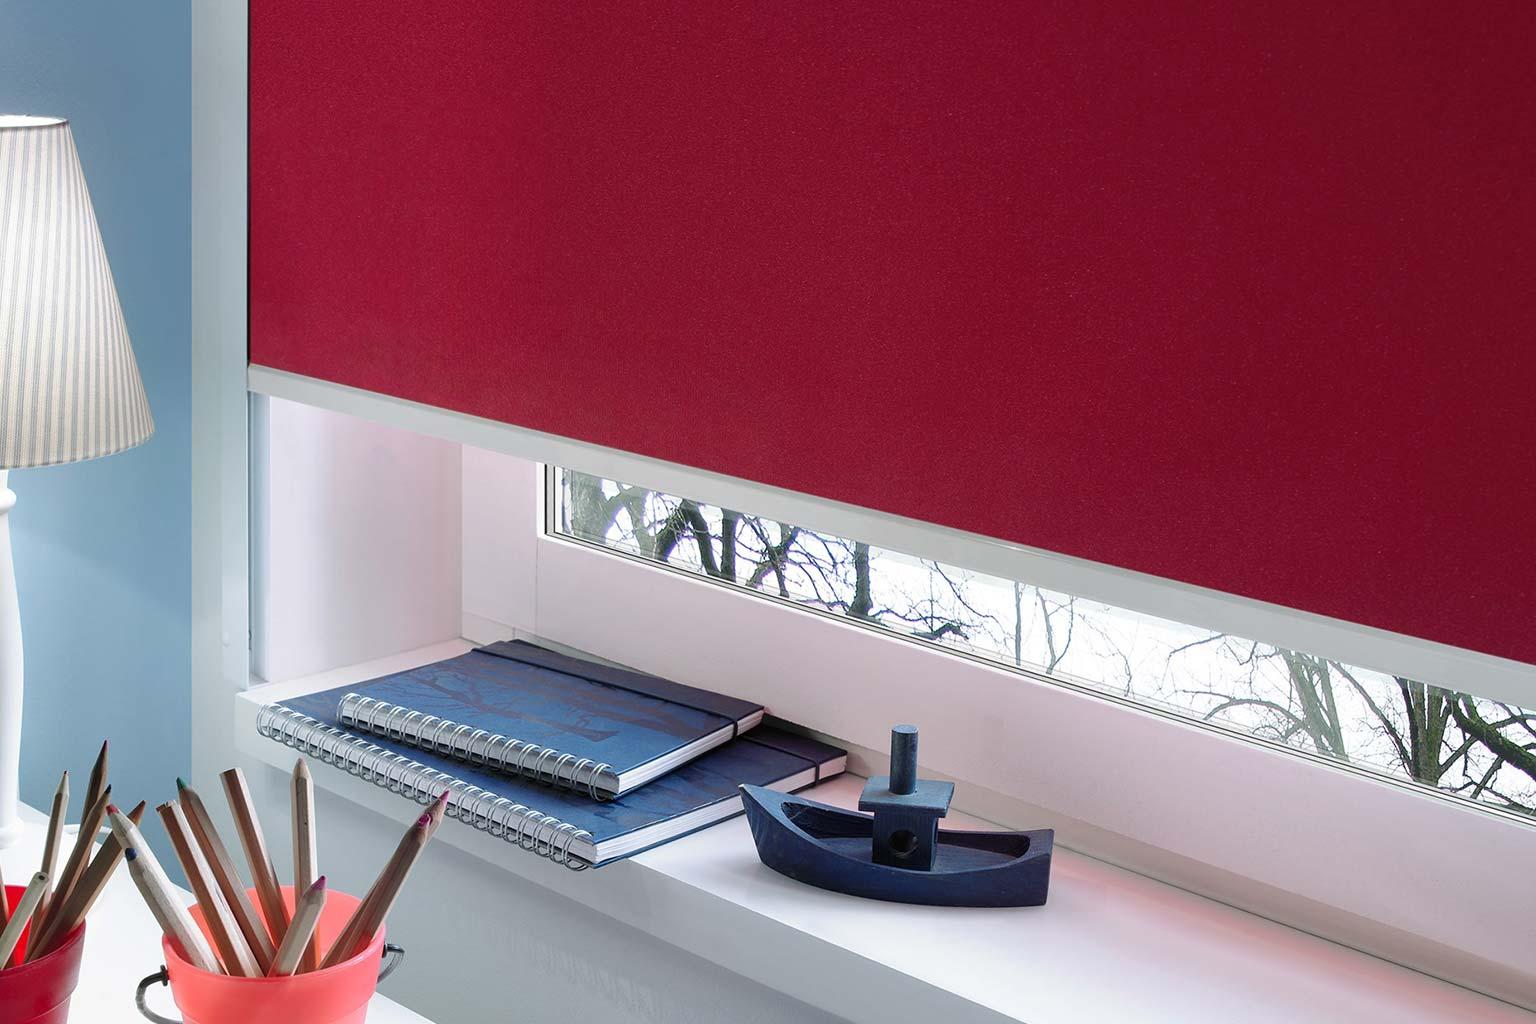 rollos ohne bohren dank selbstklebender seitenblenden. Black Bedroom Furniture Sets. Home Design Ideas